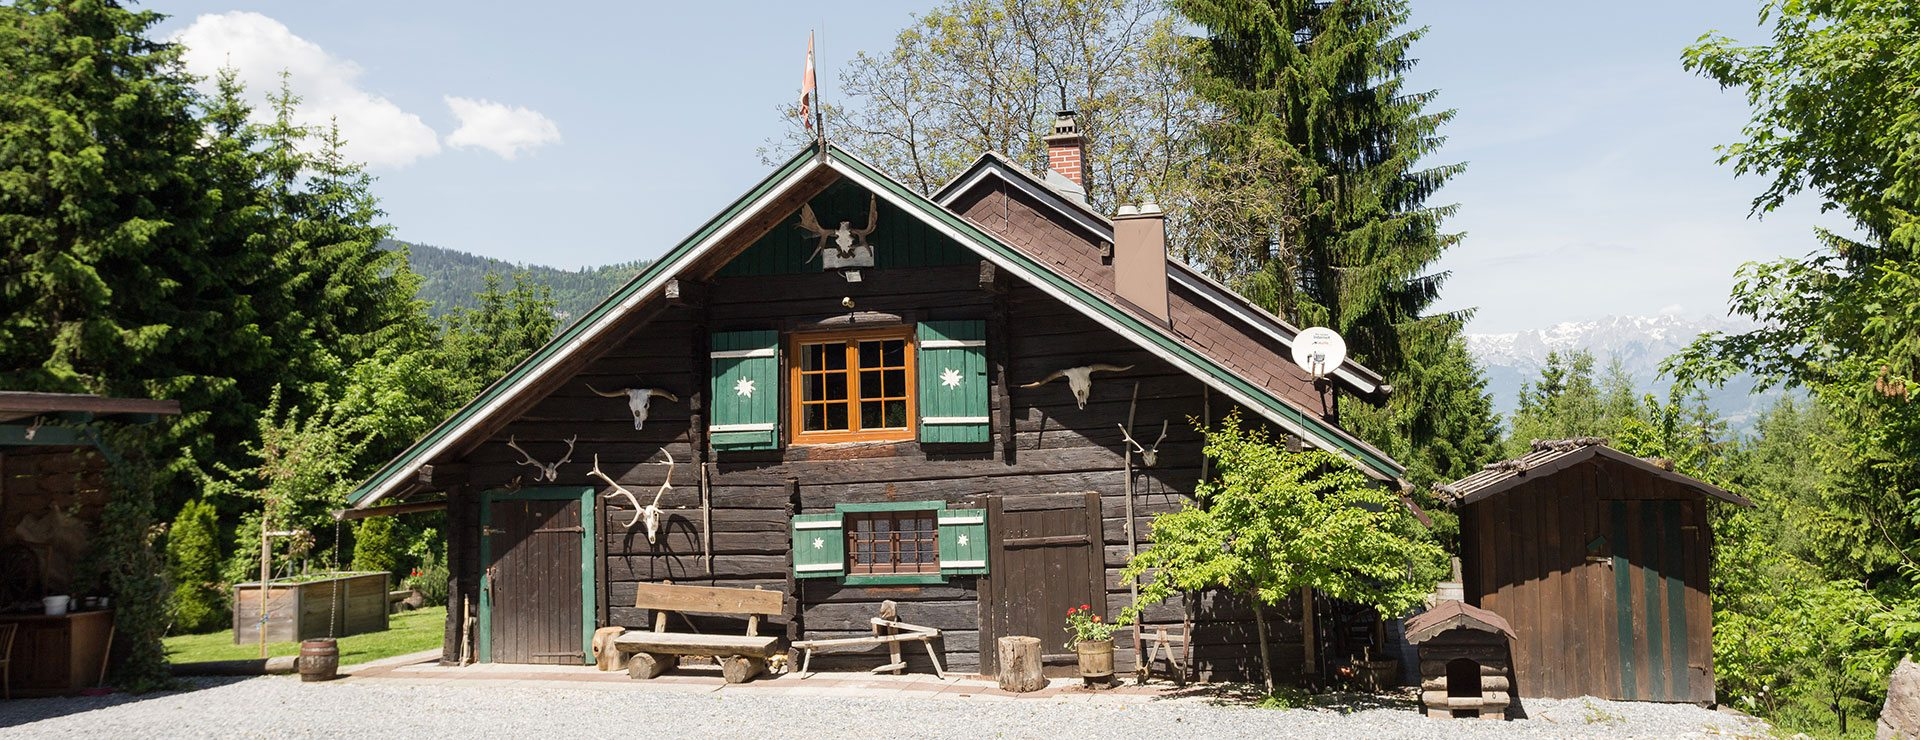 Design Ferienhaus Almhütte XL Ski Amadé, St. Veit im Pongau